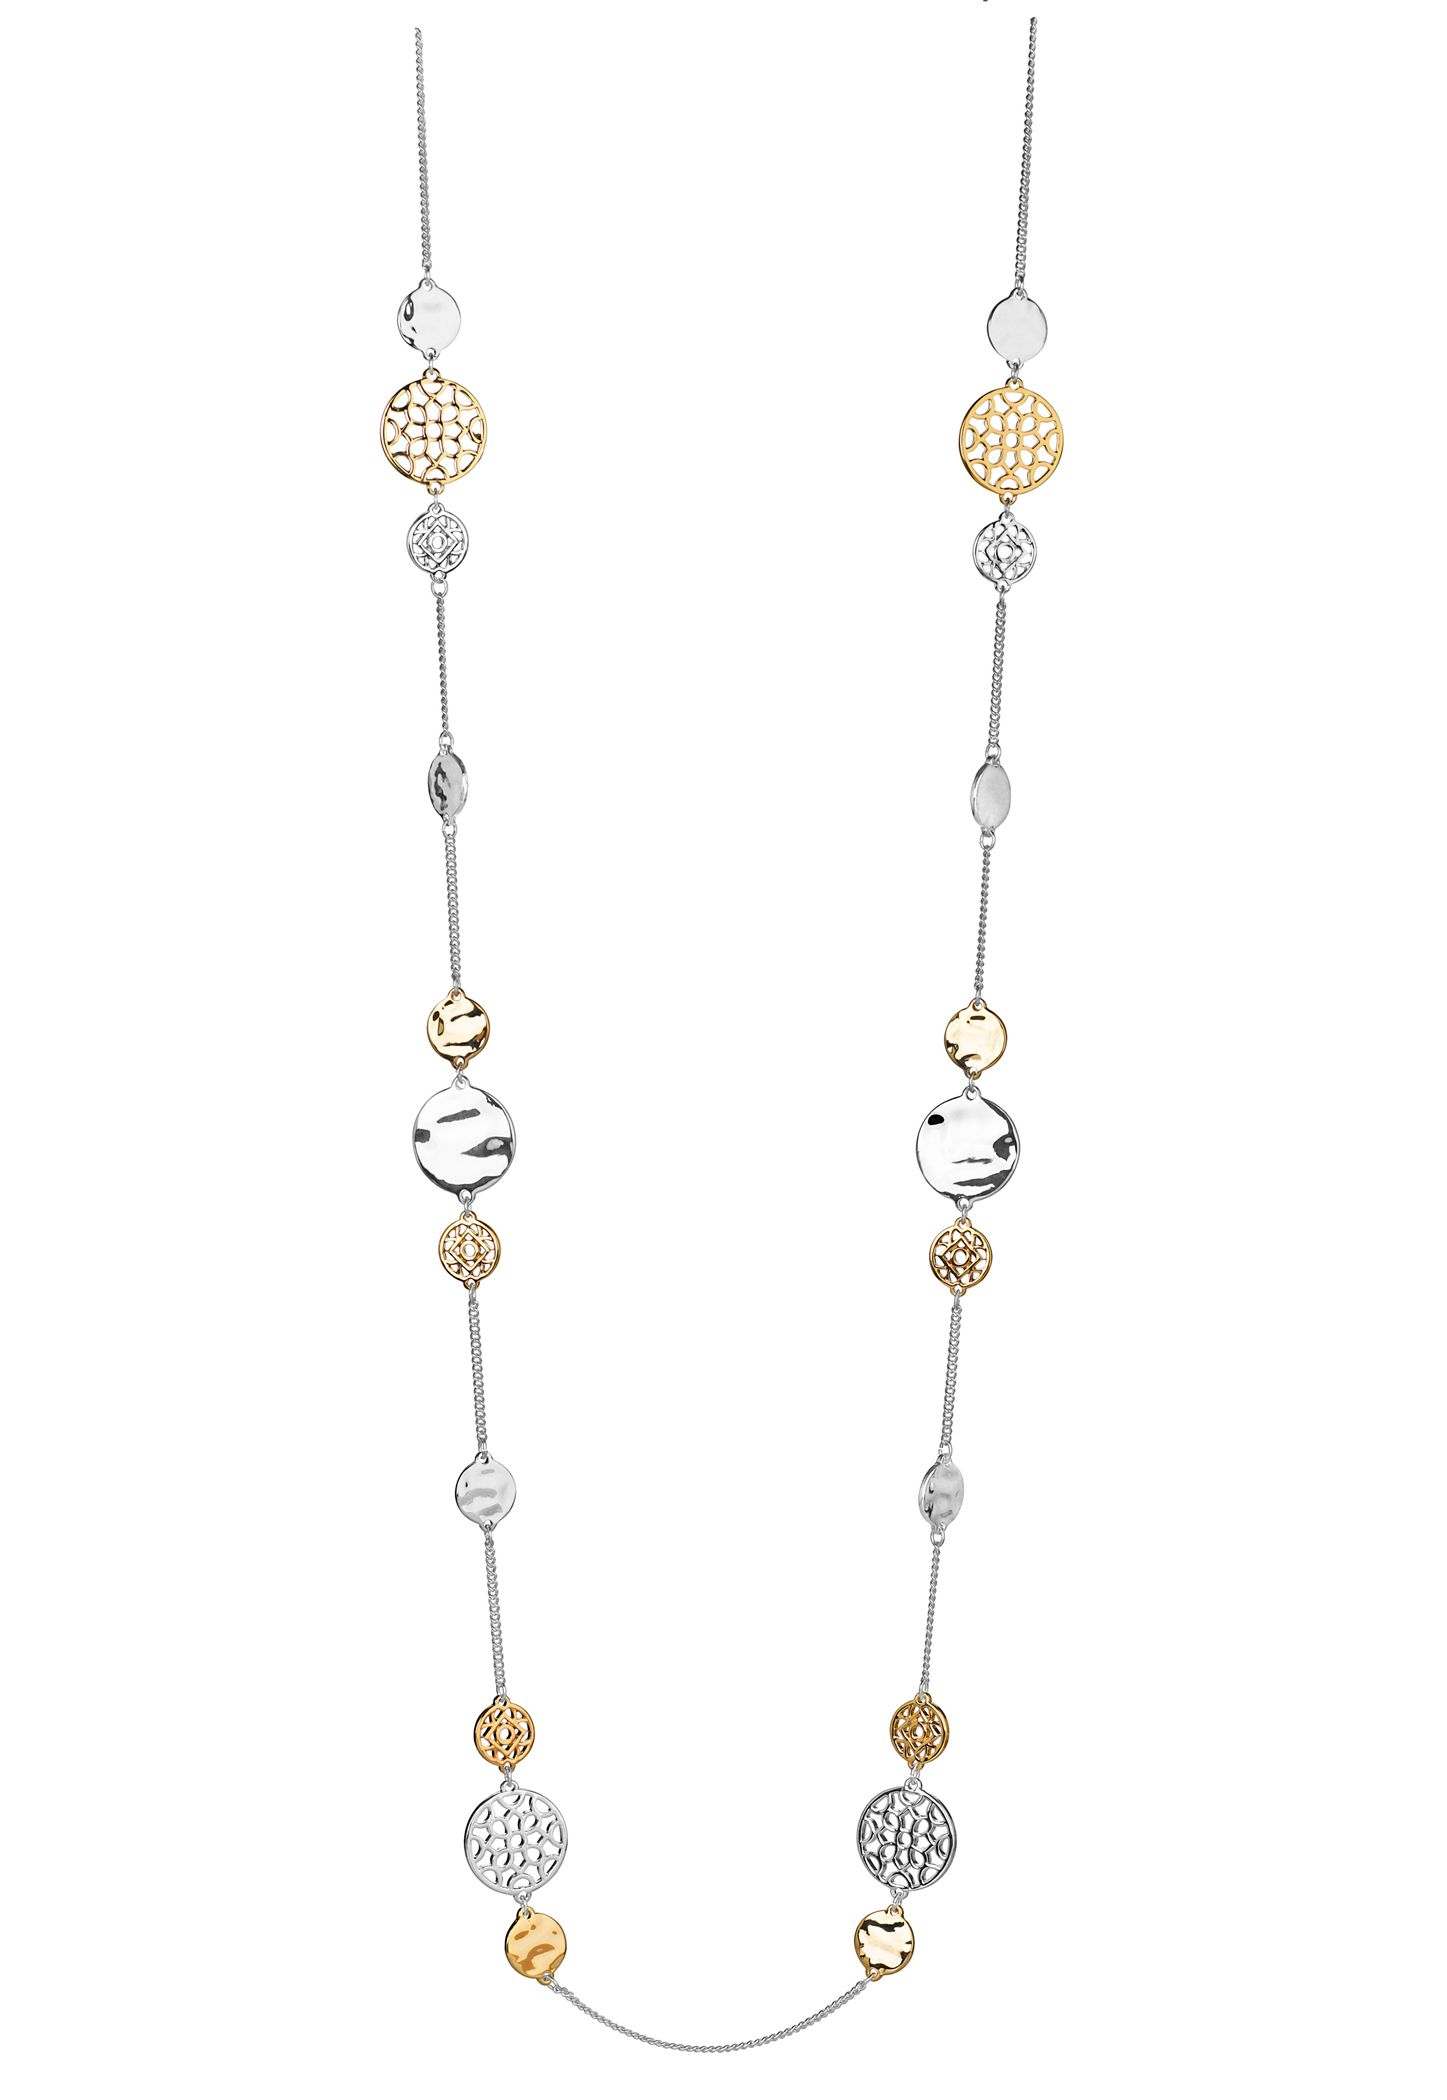 Buckley London Filigree Disc Necklace